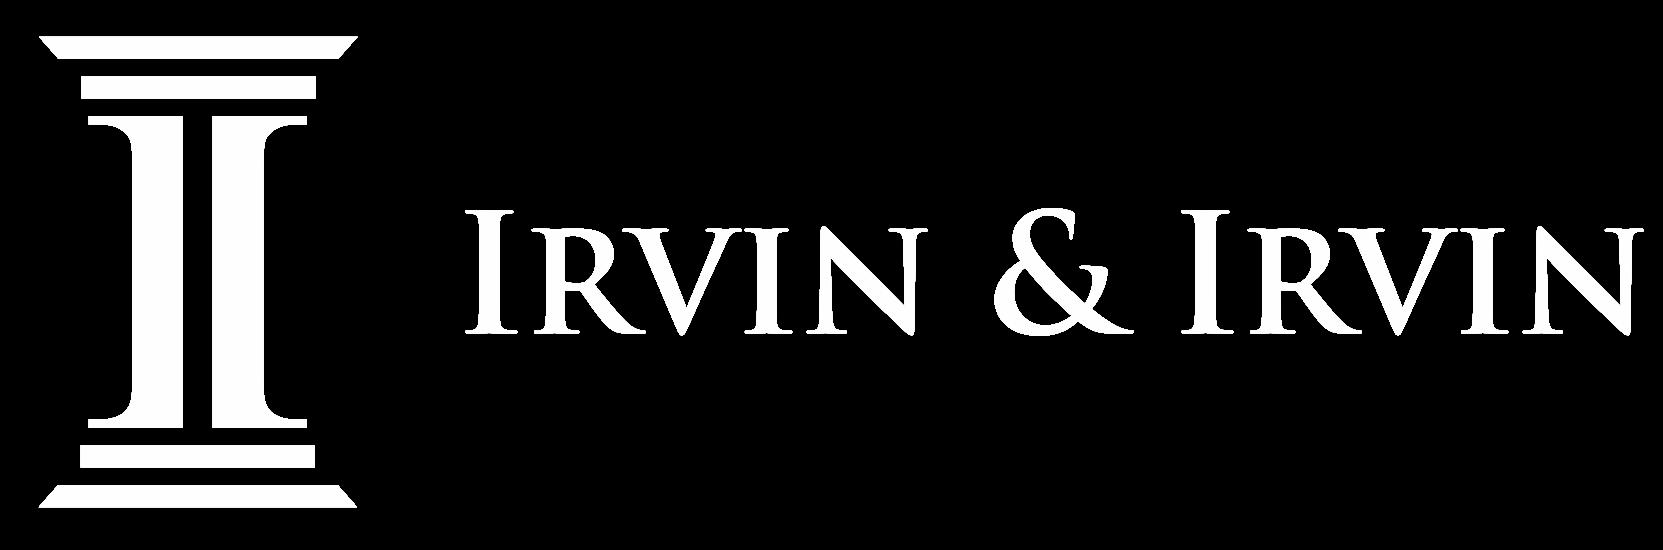 Irvin & Irvin